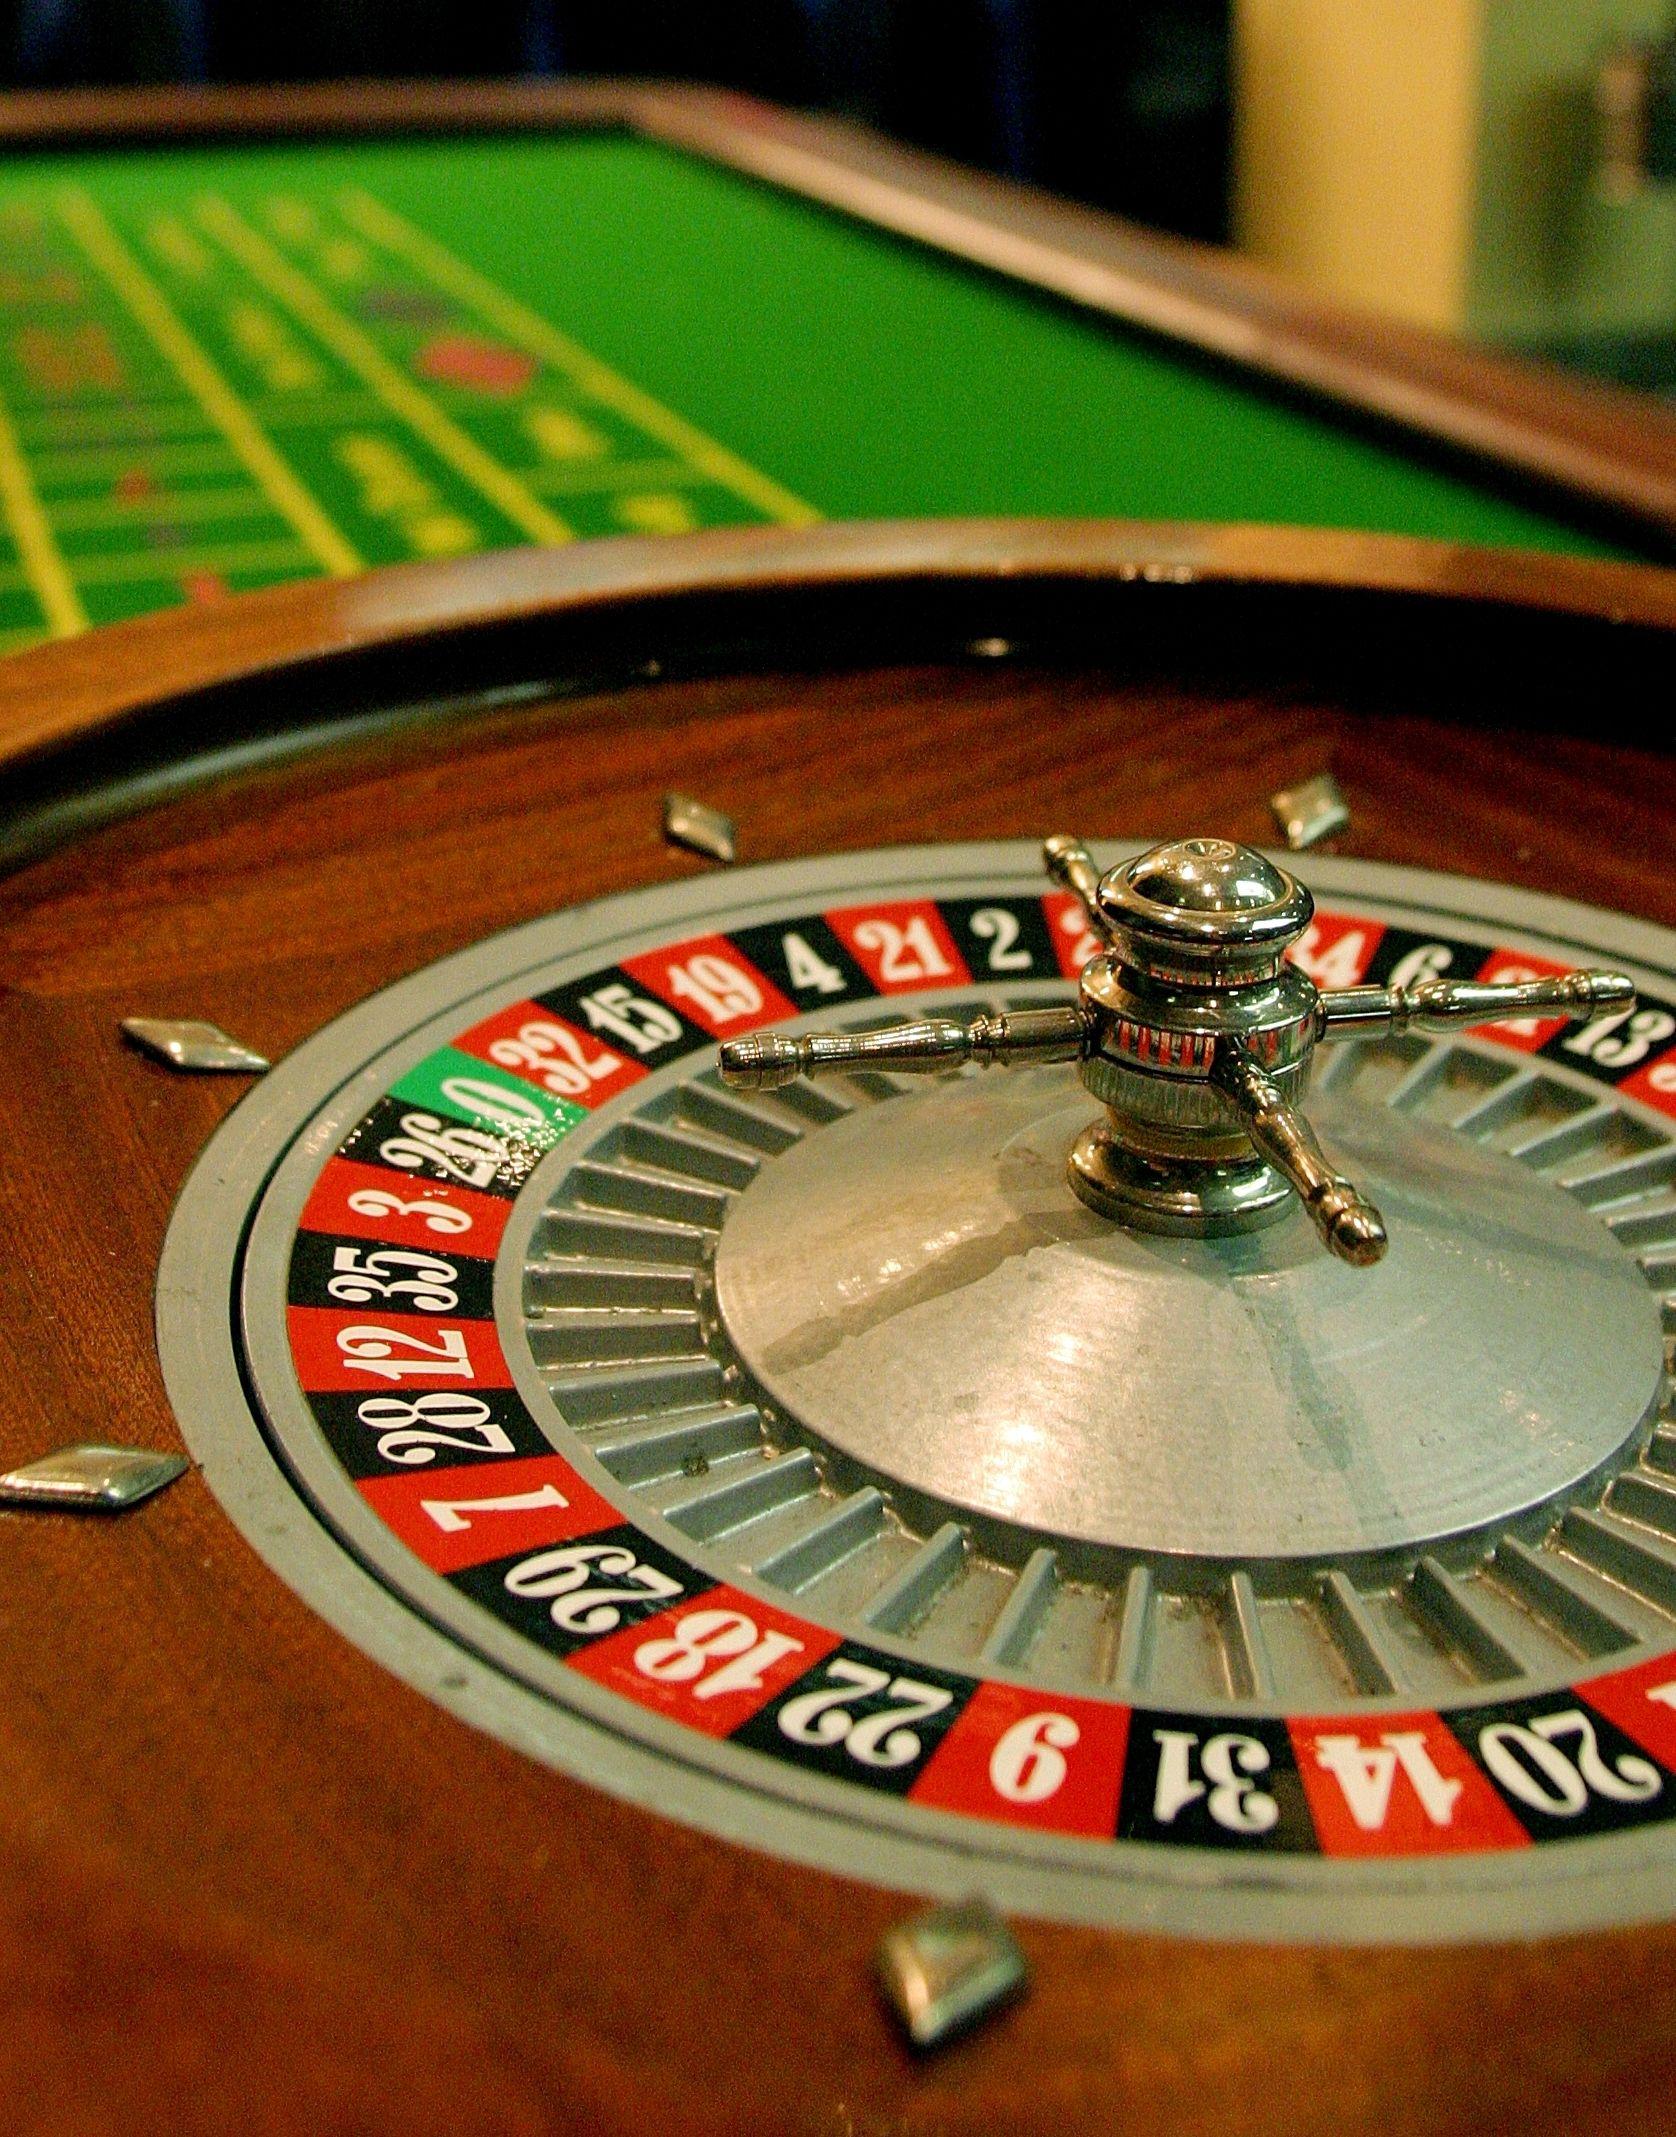 Turbo casino 5 euro free